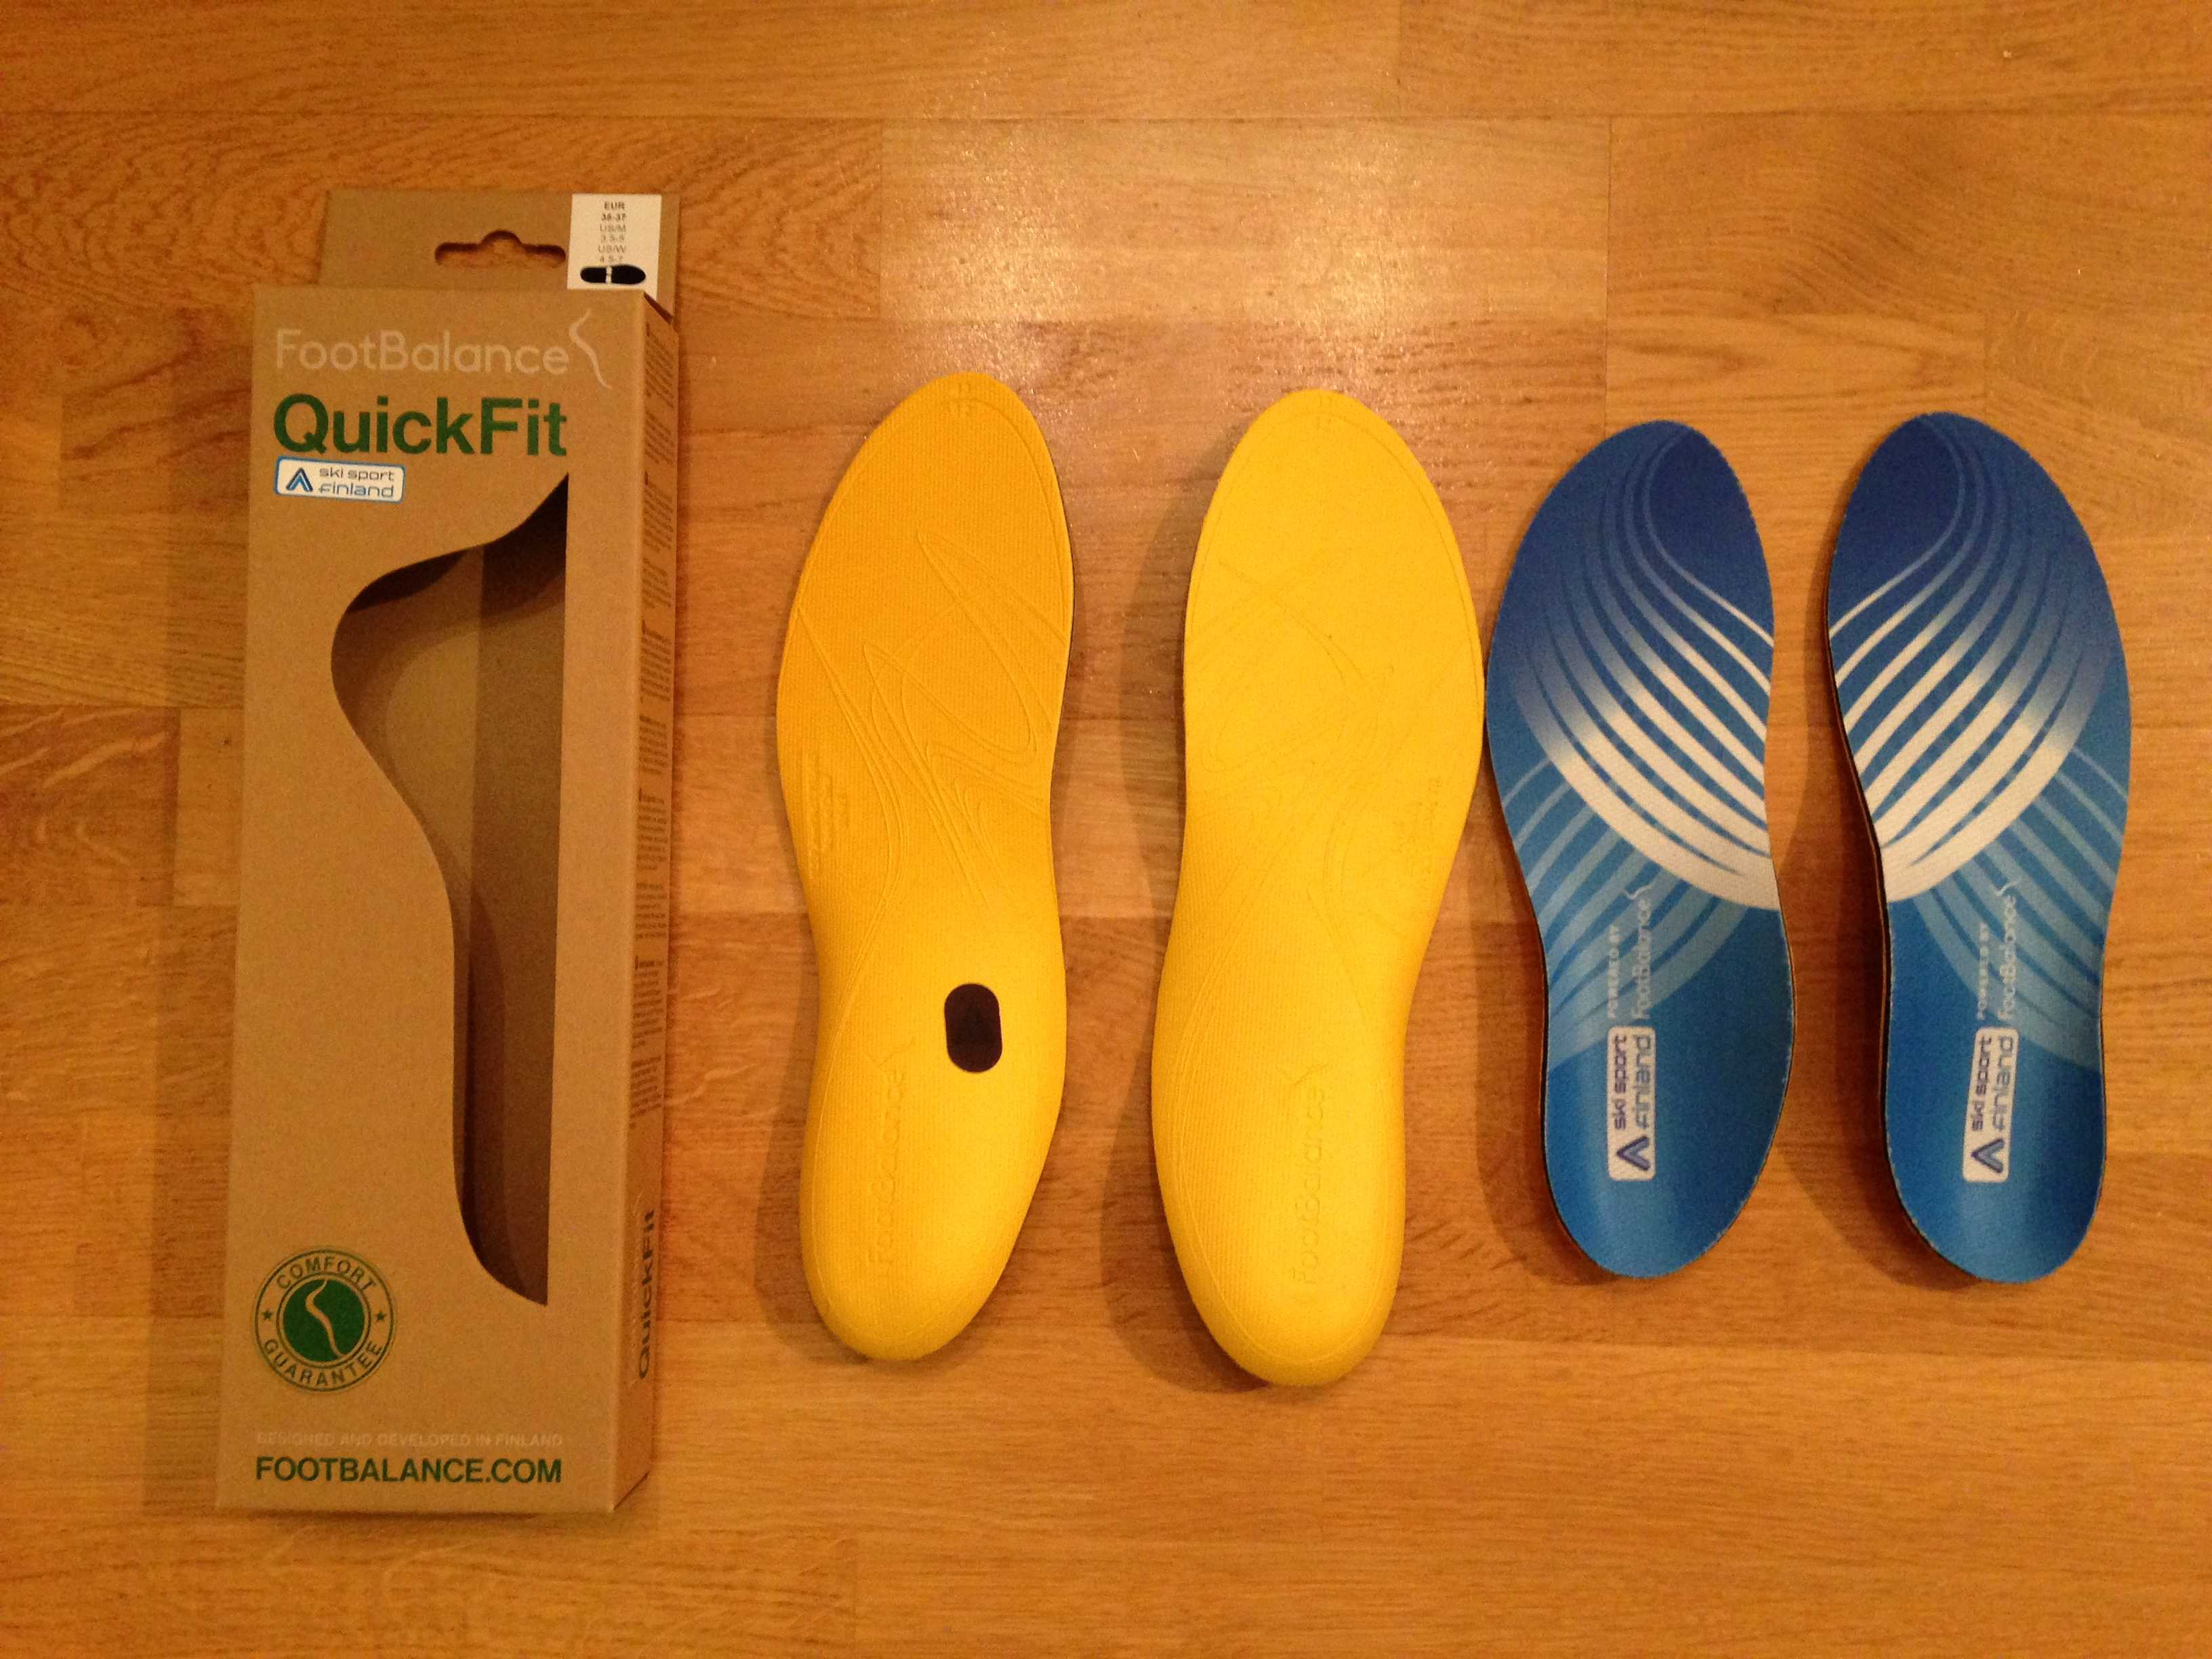 Koeajossa Footbalance Ski Sport QuickFit -pohjalliset a48534112d